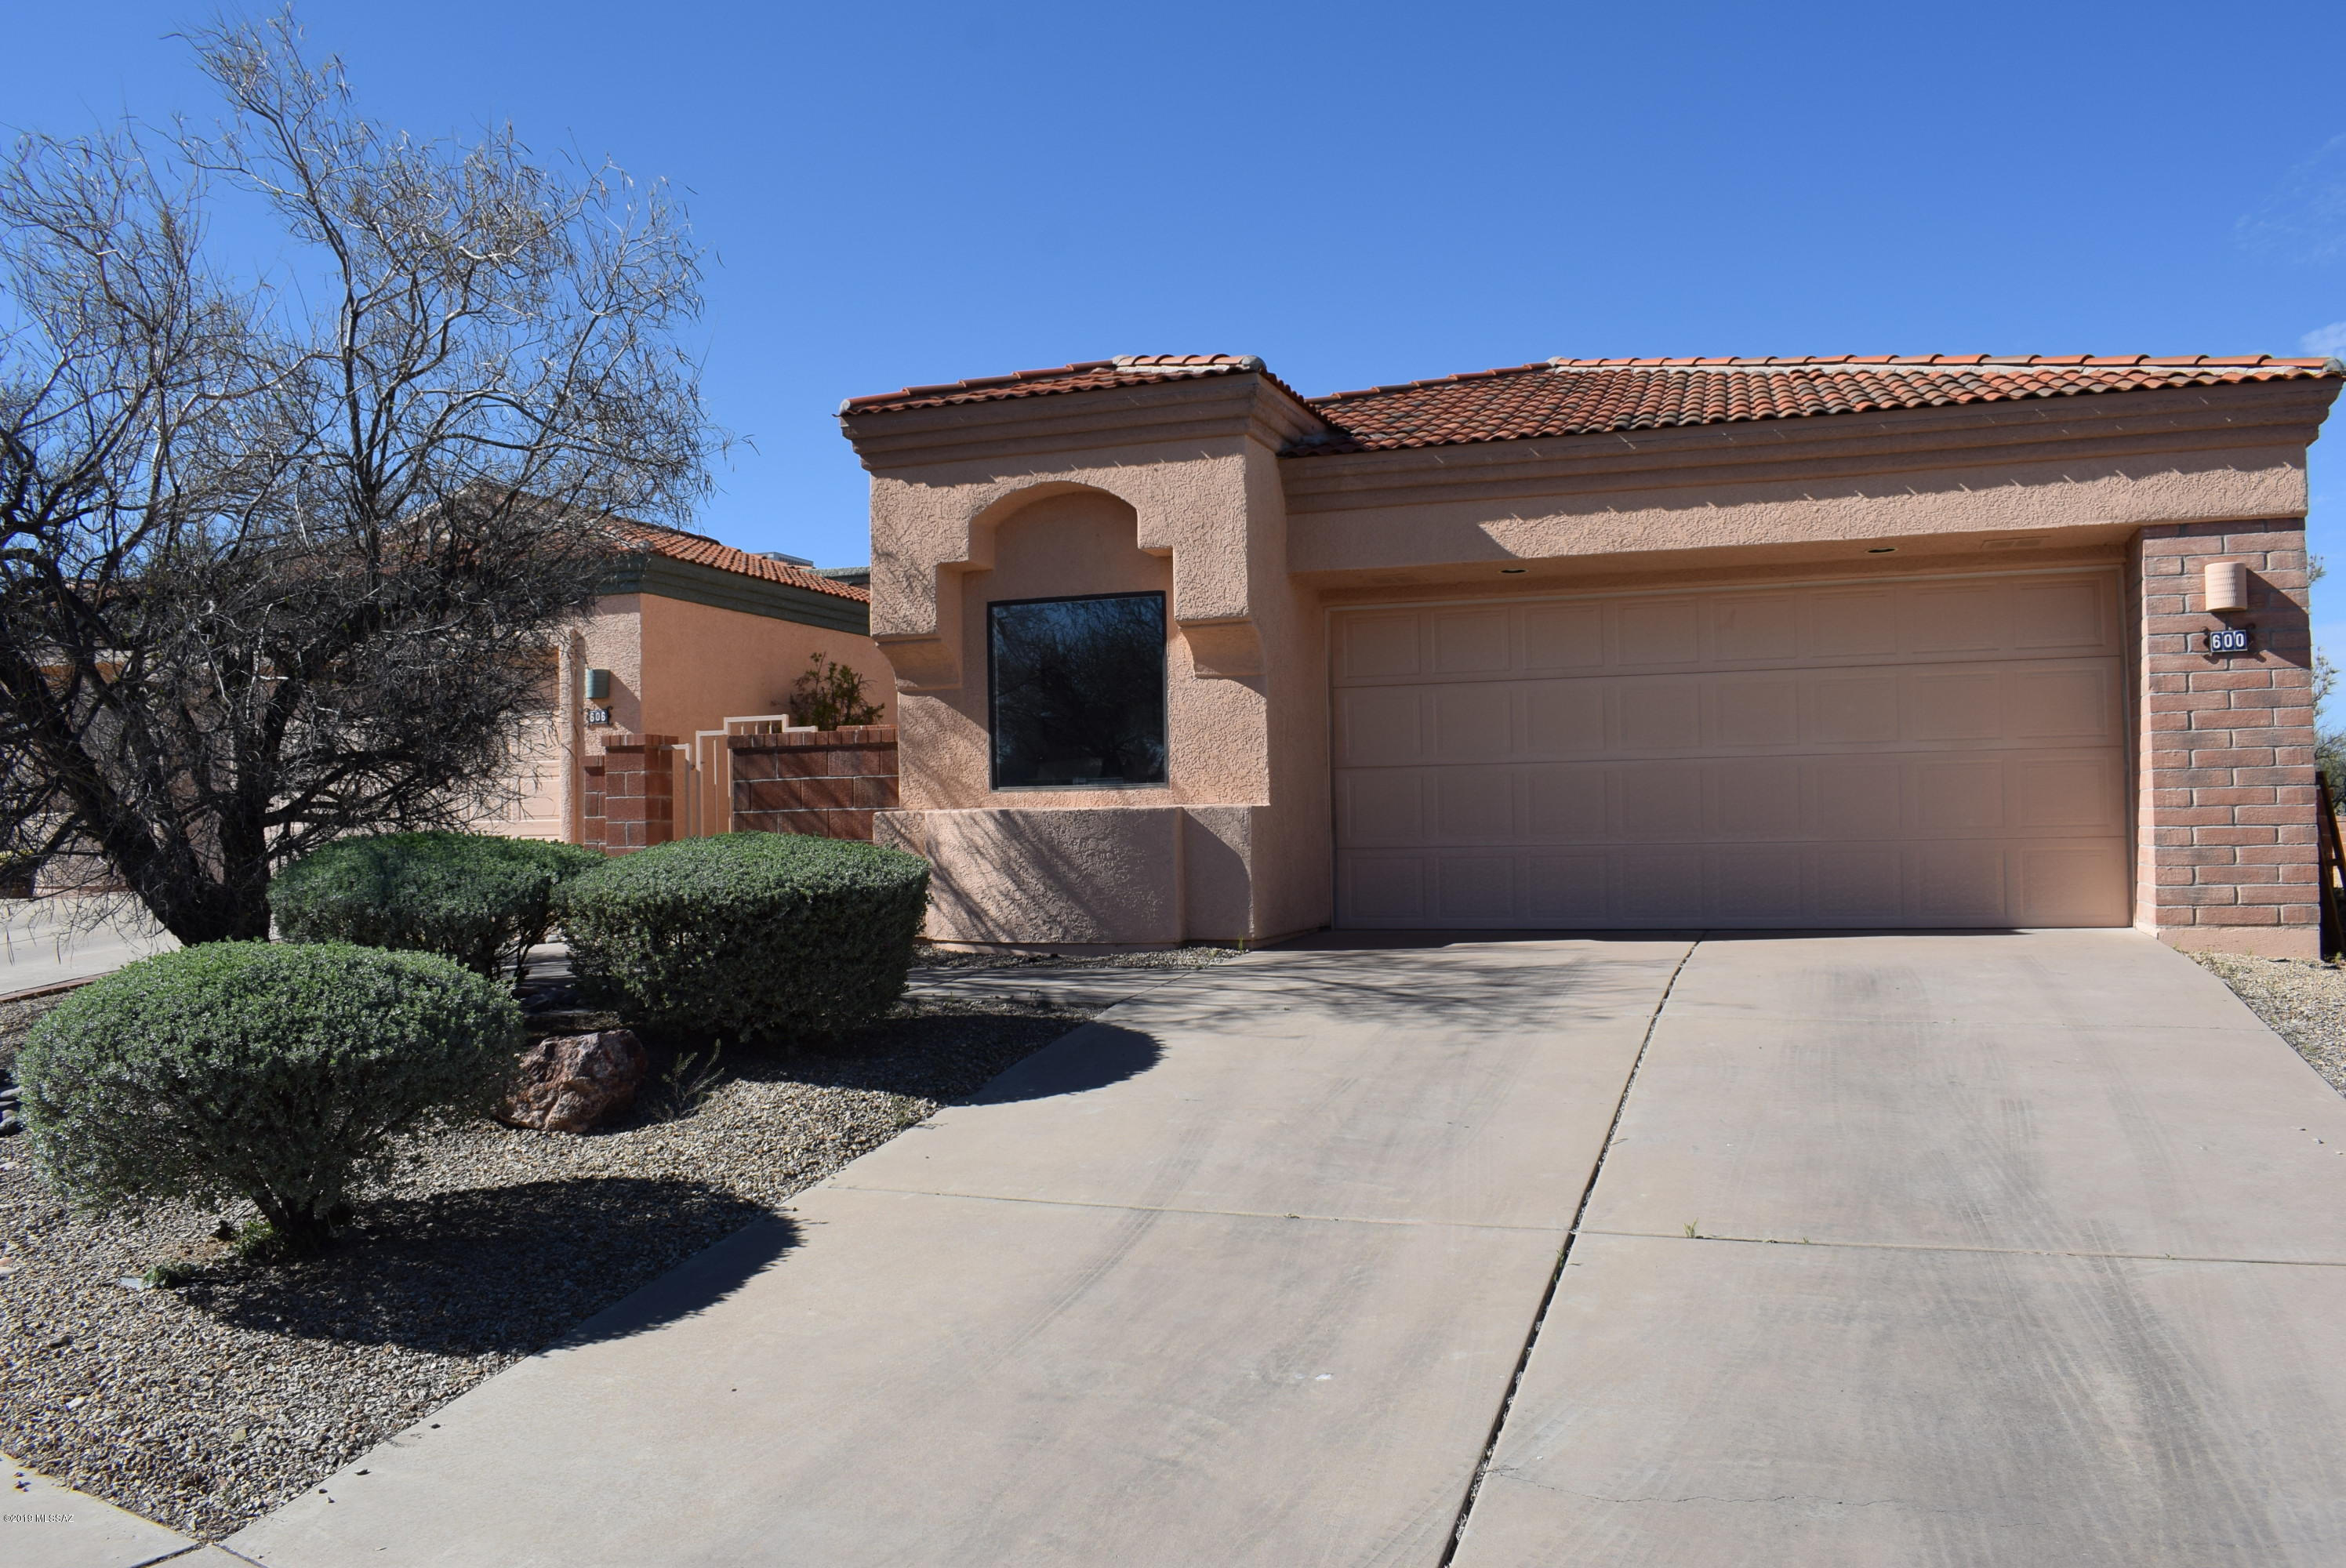 600 W Union Bell Drive, Green Valley, AZ | MLS# 21908543